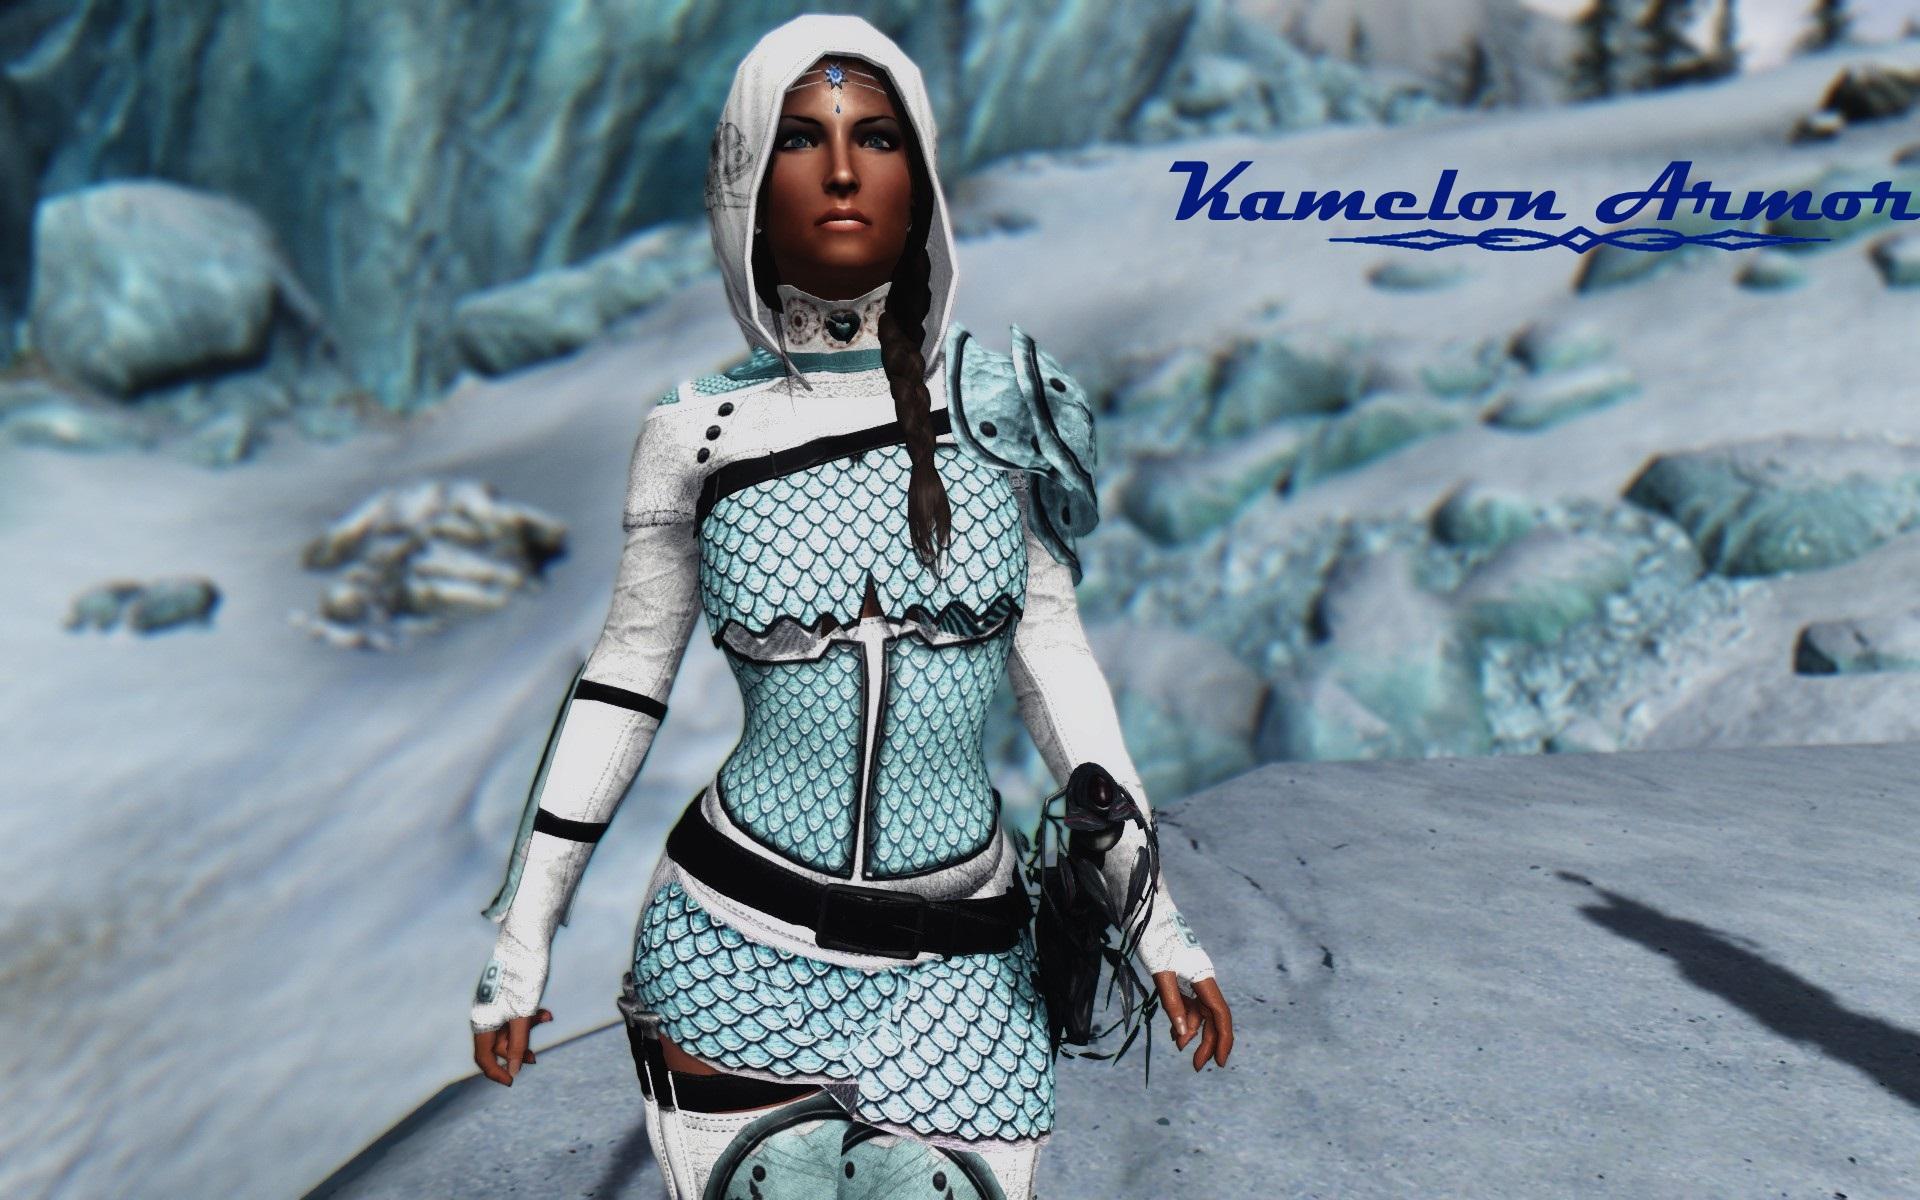 Kameleon_Armor.jpg